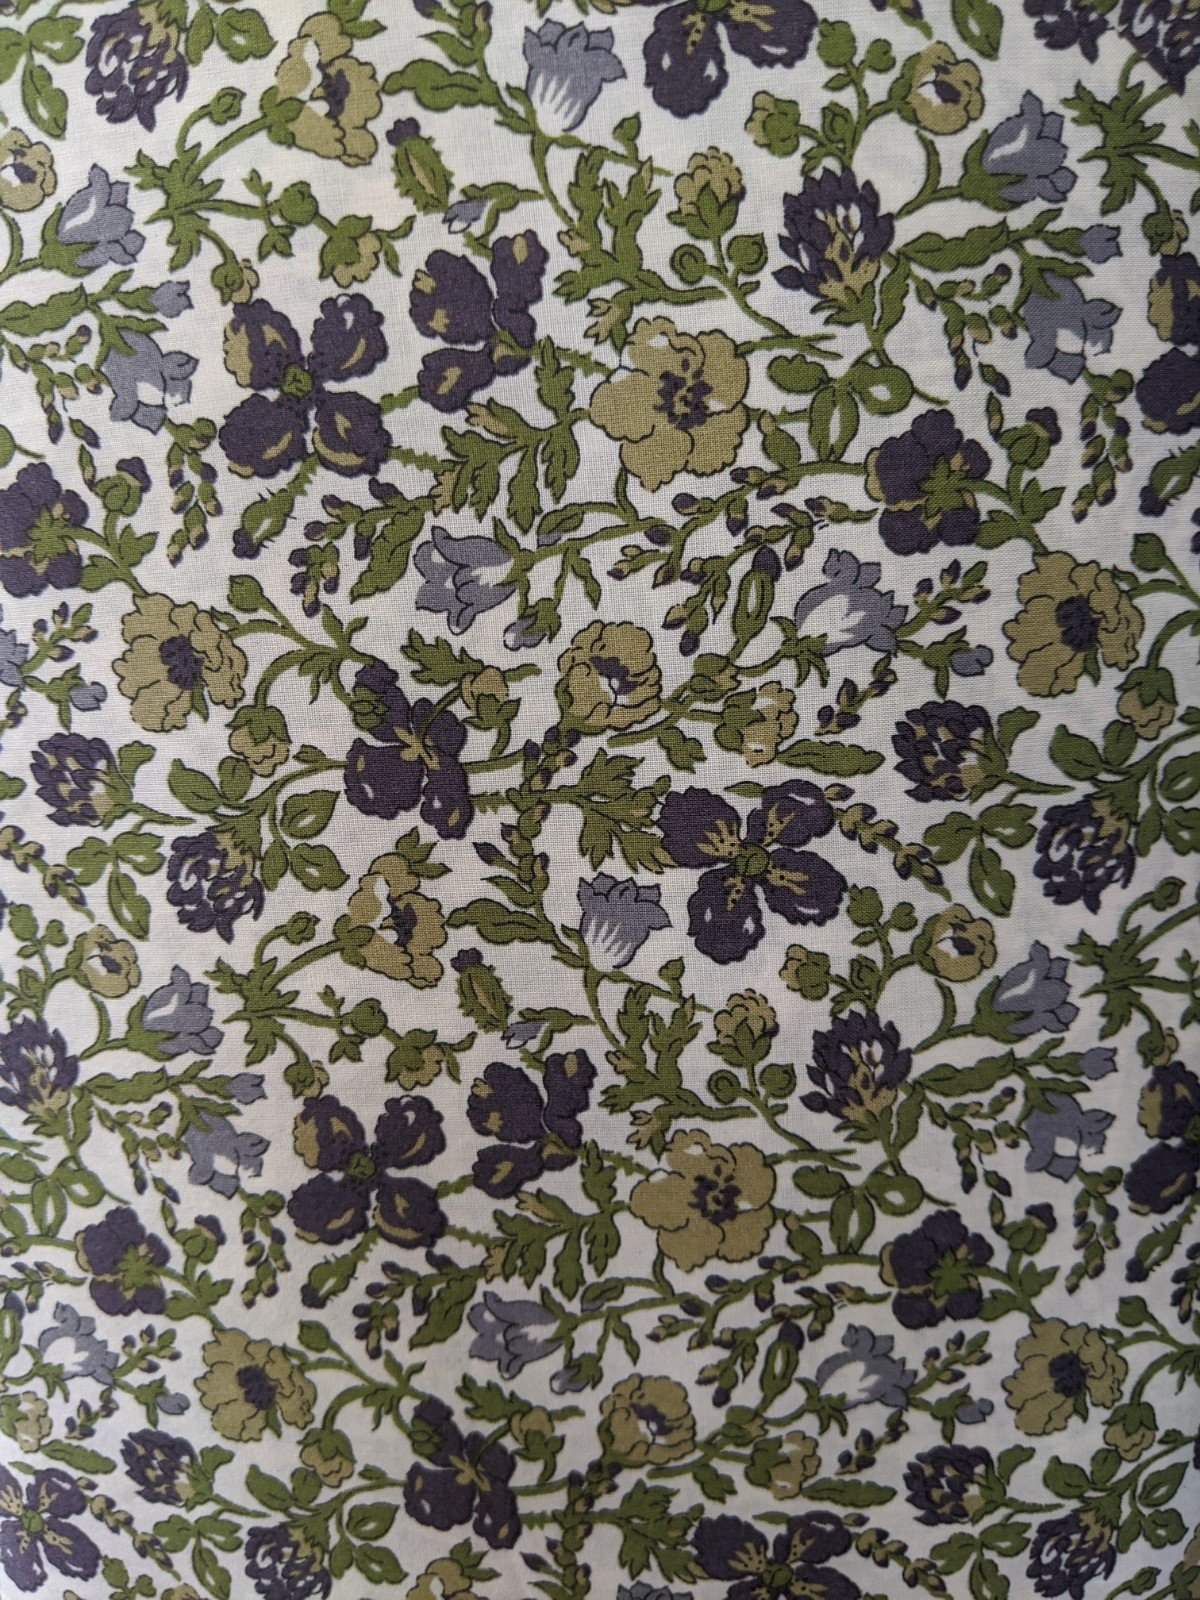 Liberty of London Cotton Lawn - Pansy